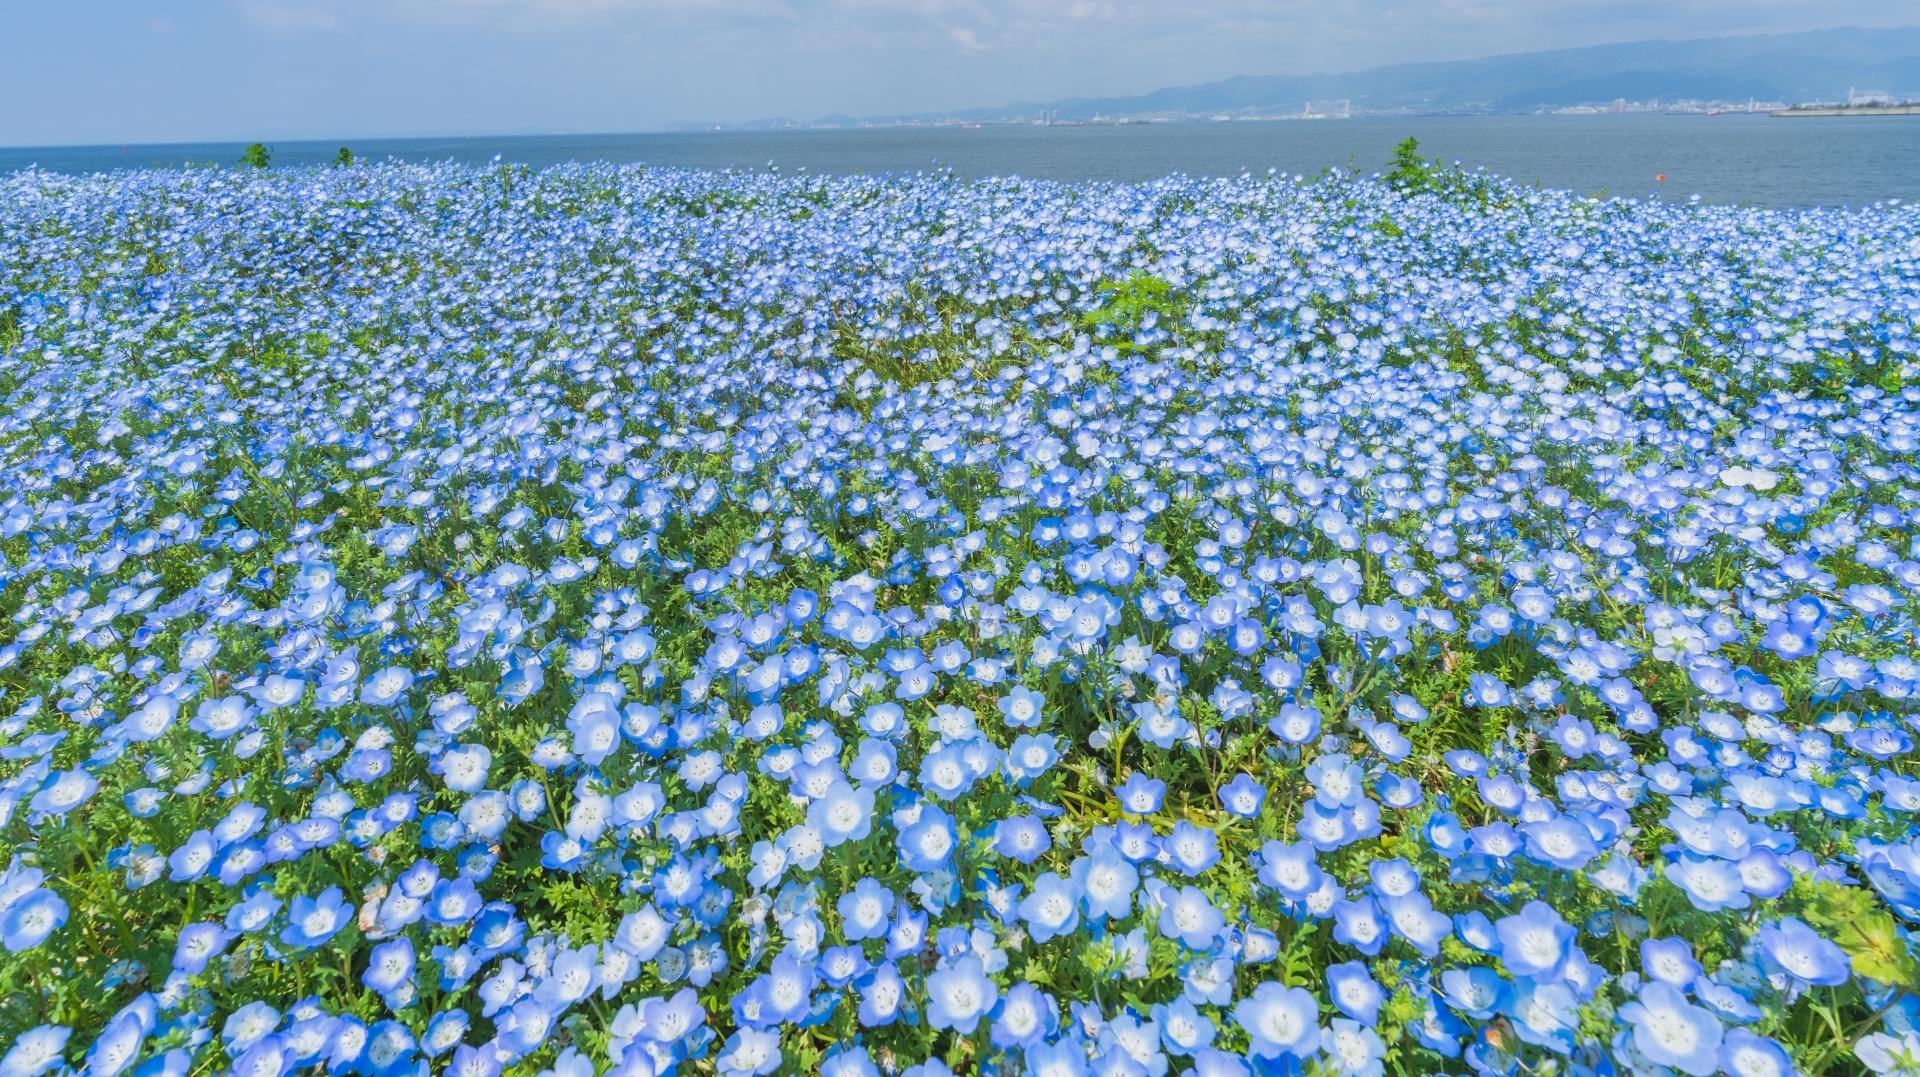 See a million nemophila flowers blooming at Osaka Maishima Seaside Park this spring